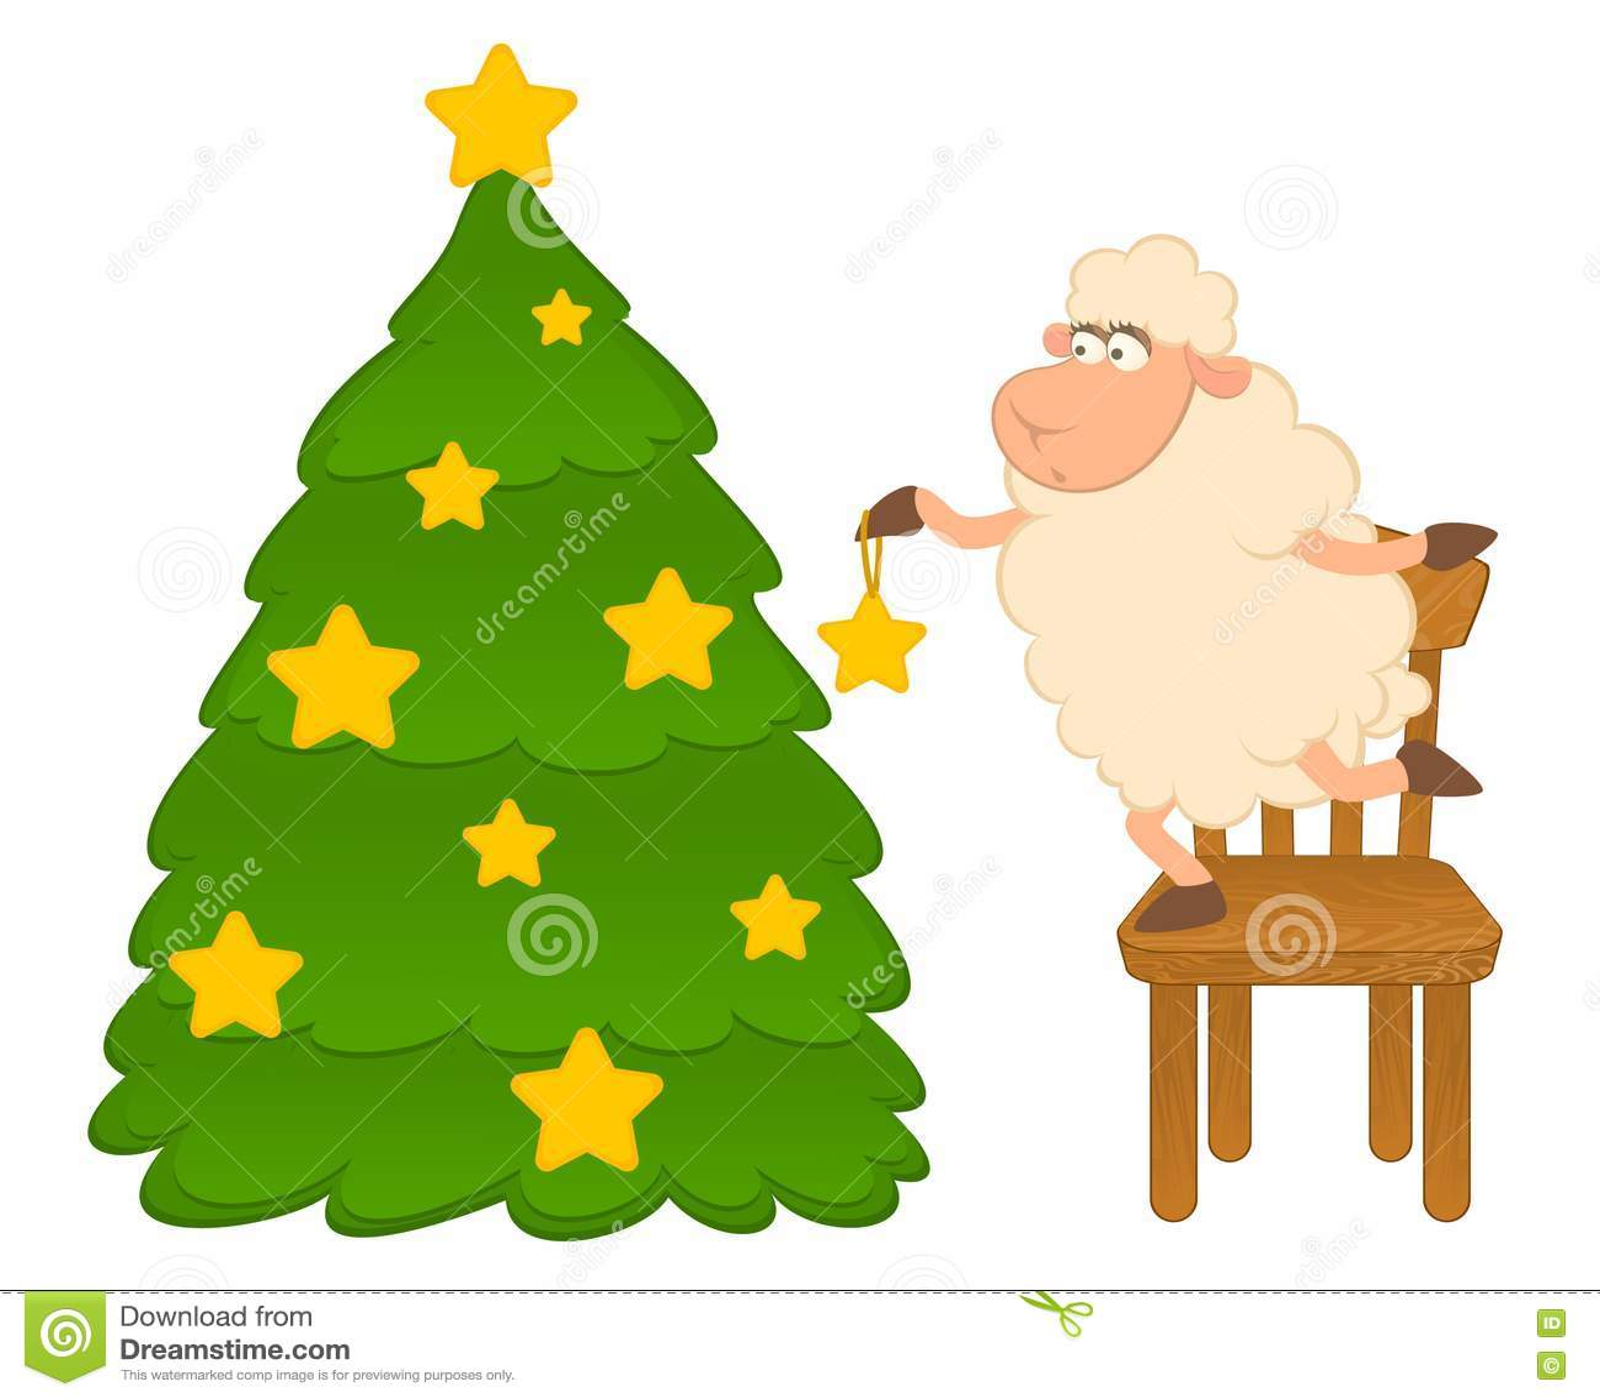 Cartoon Funny Sheep Dresses Up A Fir Tree Stock Vector